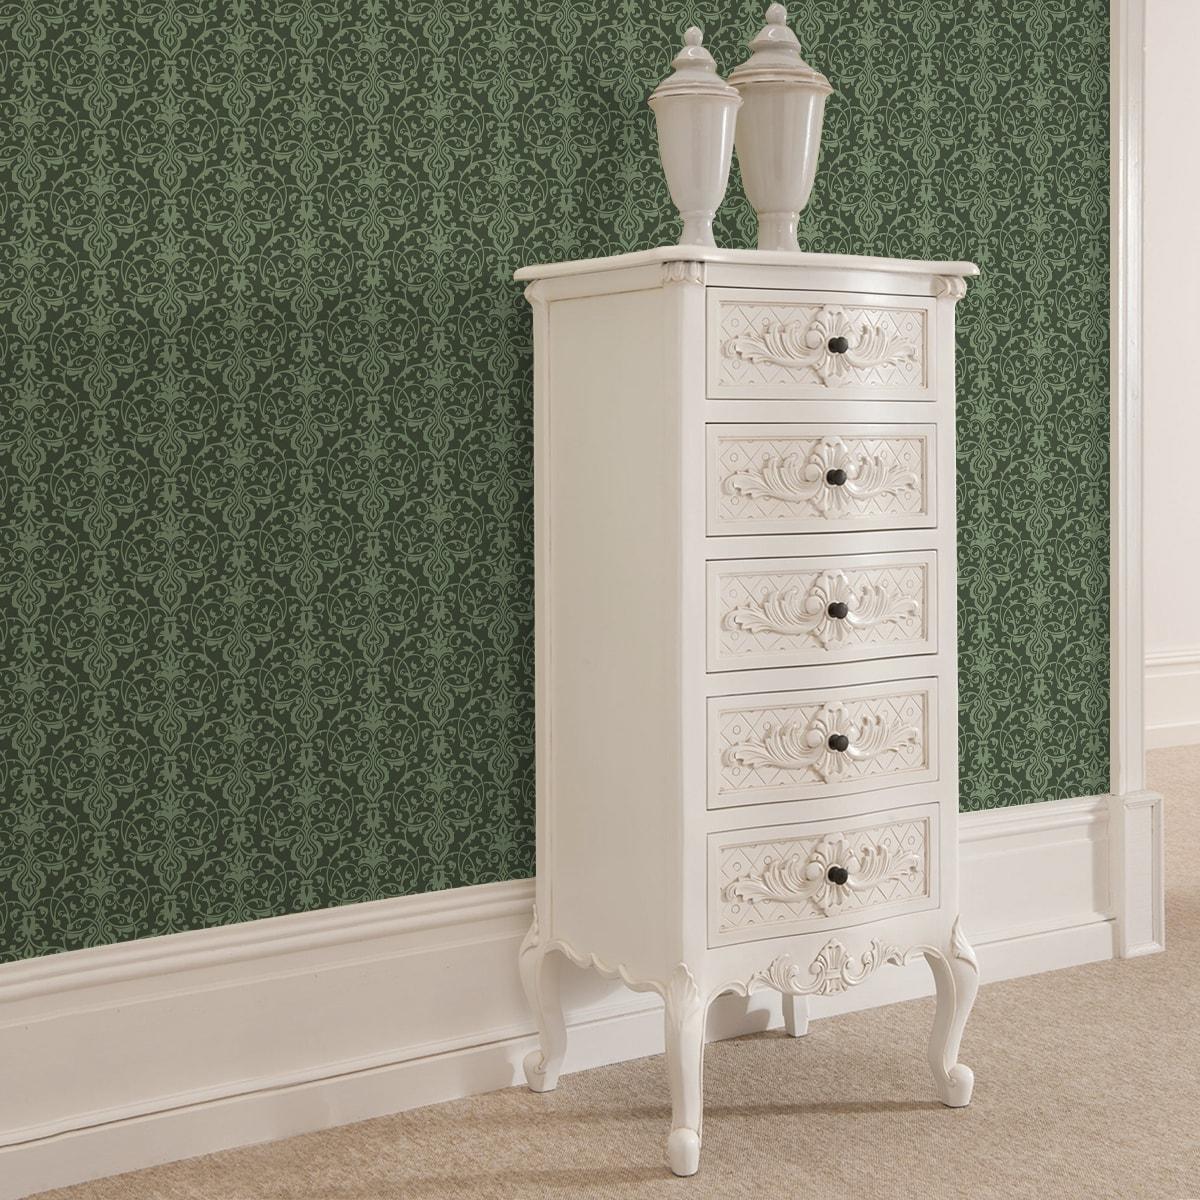 Klassische Tapete mit üppigem Damast Muster auf grün angepasst an Farrow and Ball Wandfarben- Vliestapete Ornamente  2